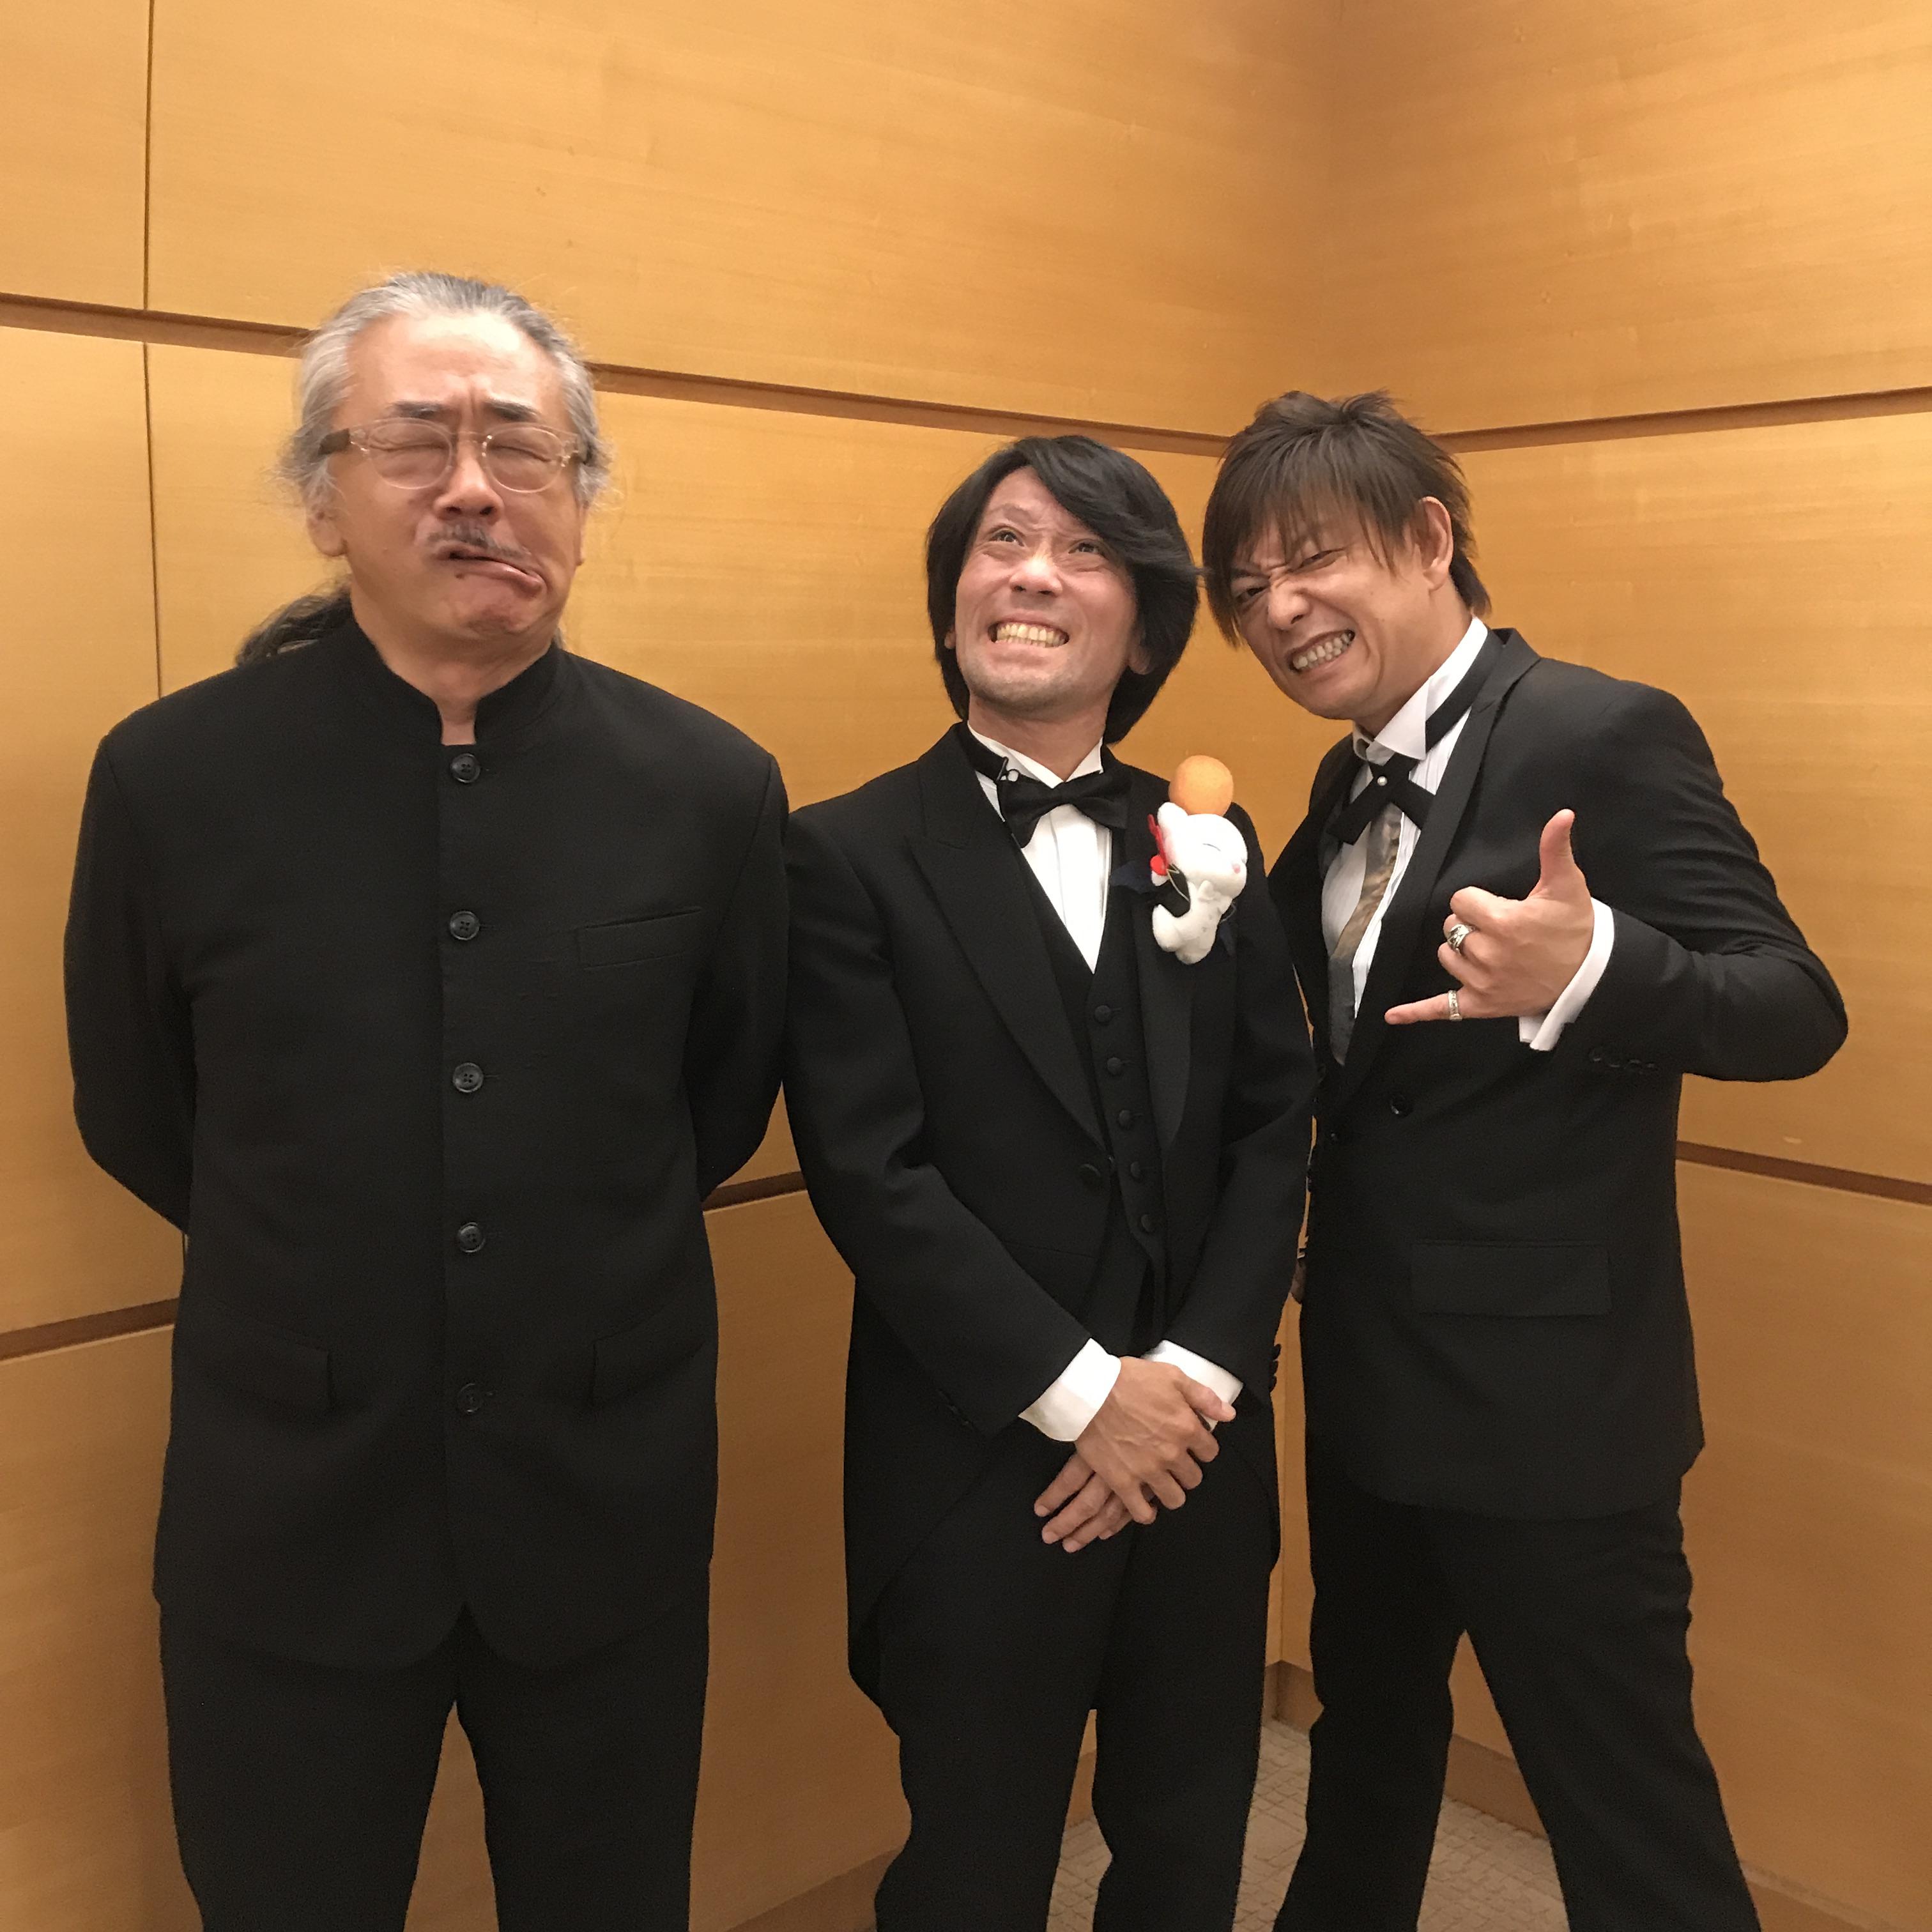 https://jp.finalfantasyxiv.com/pr/blog/blog_image/20171013_rr_4_b.JPG